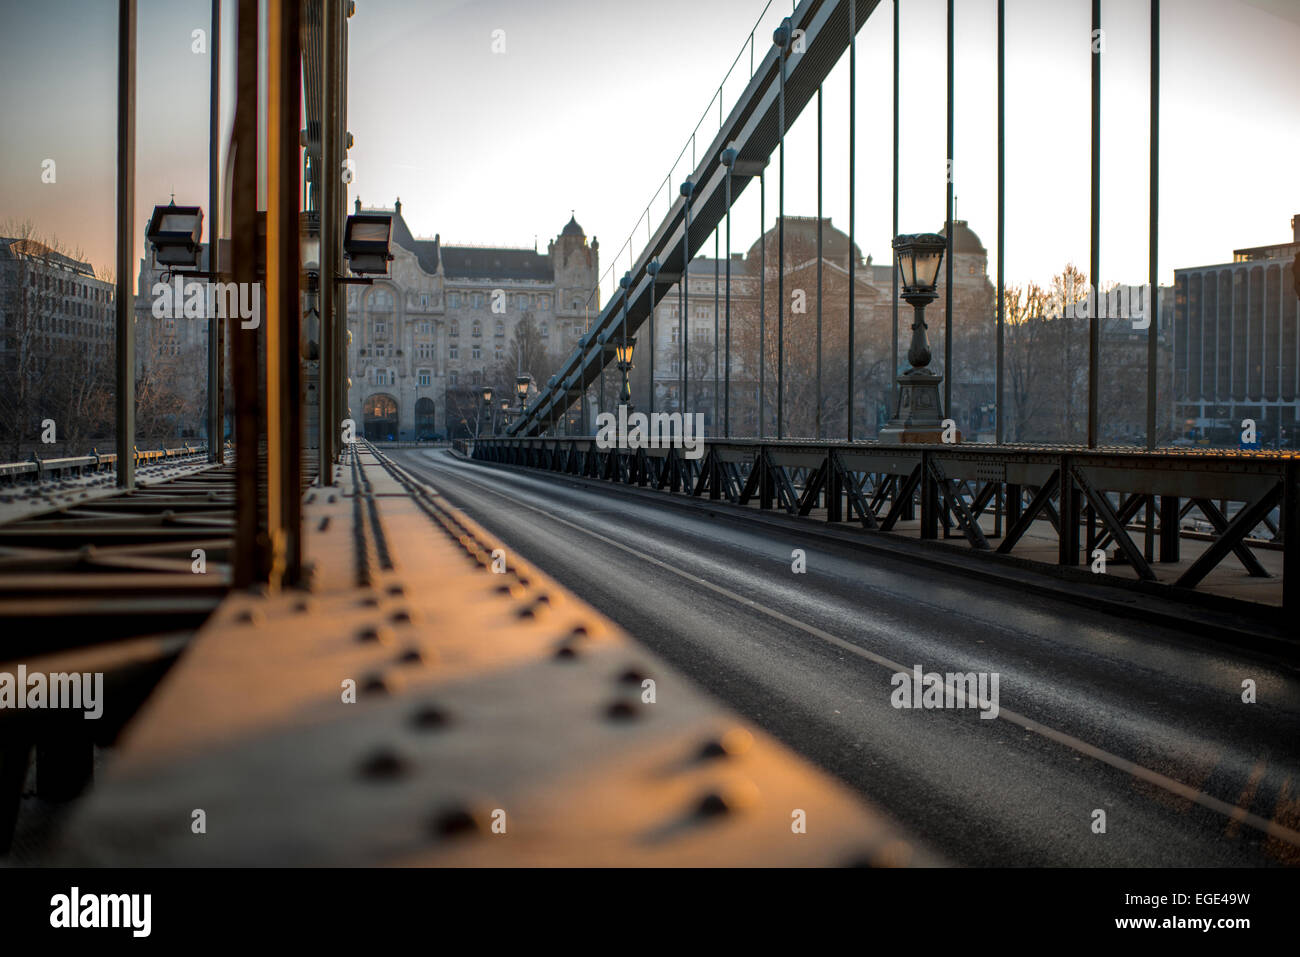 Szechenyi Chain Bridge - Stock Image